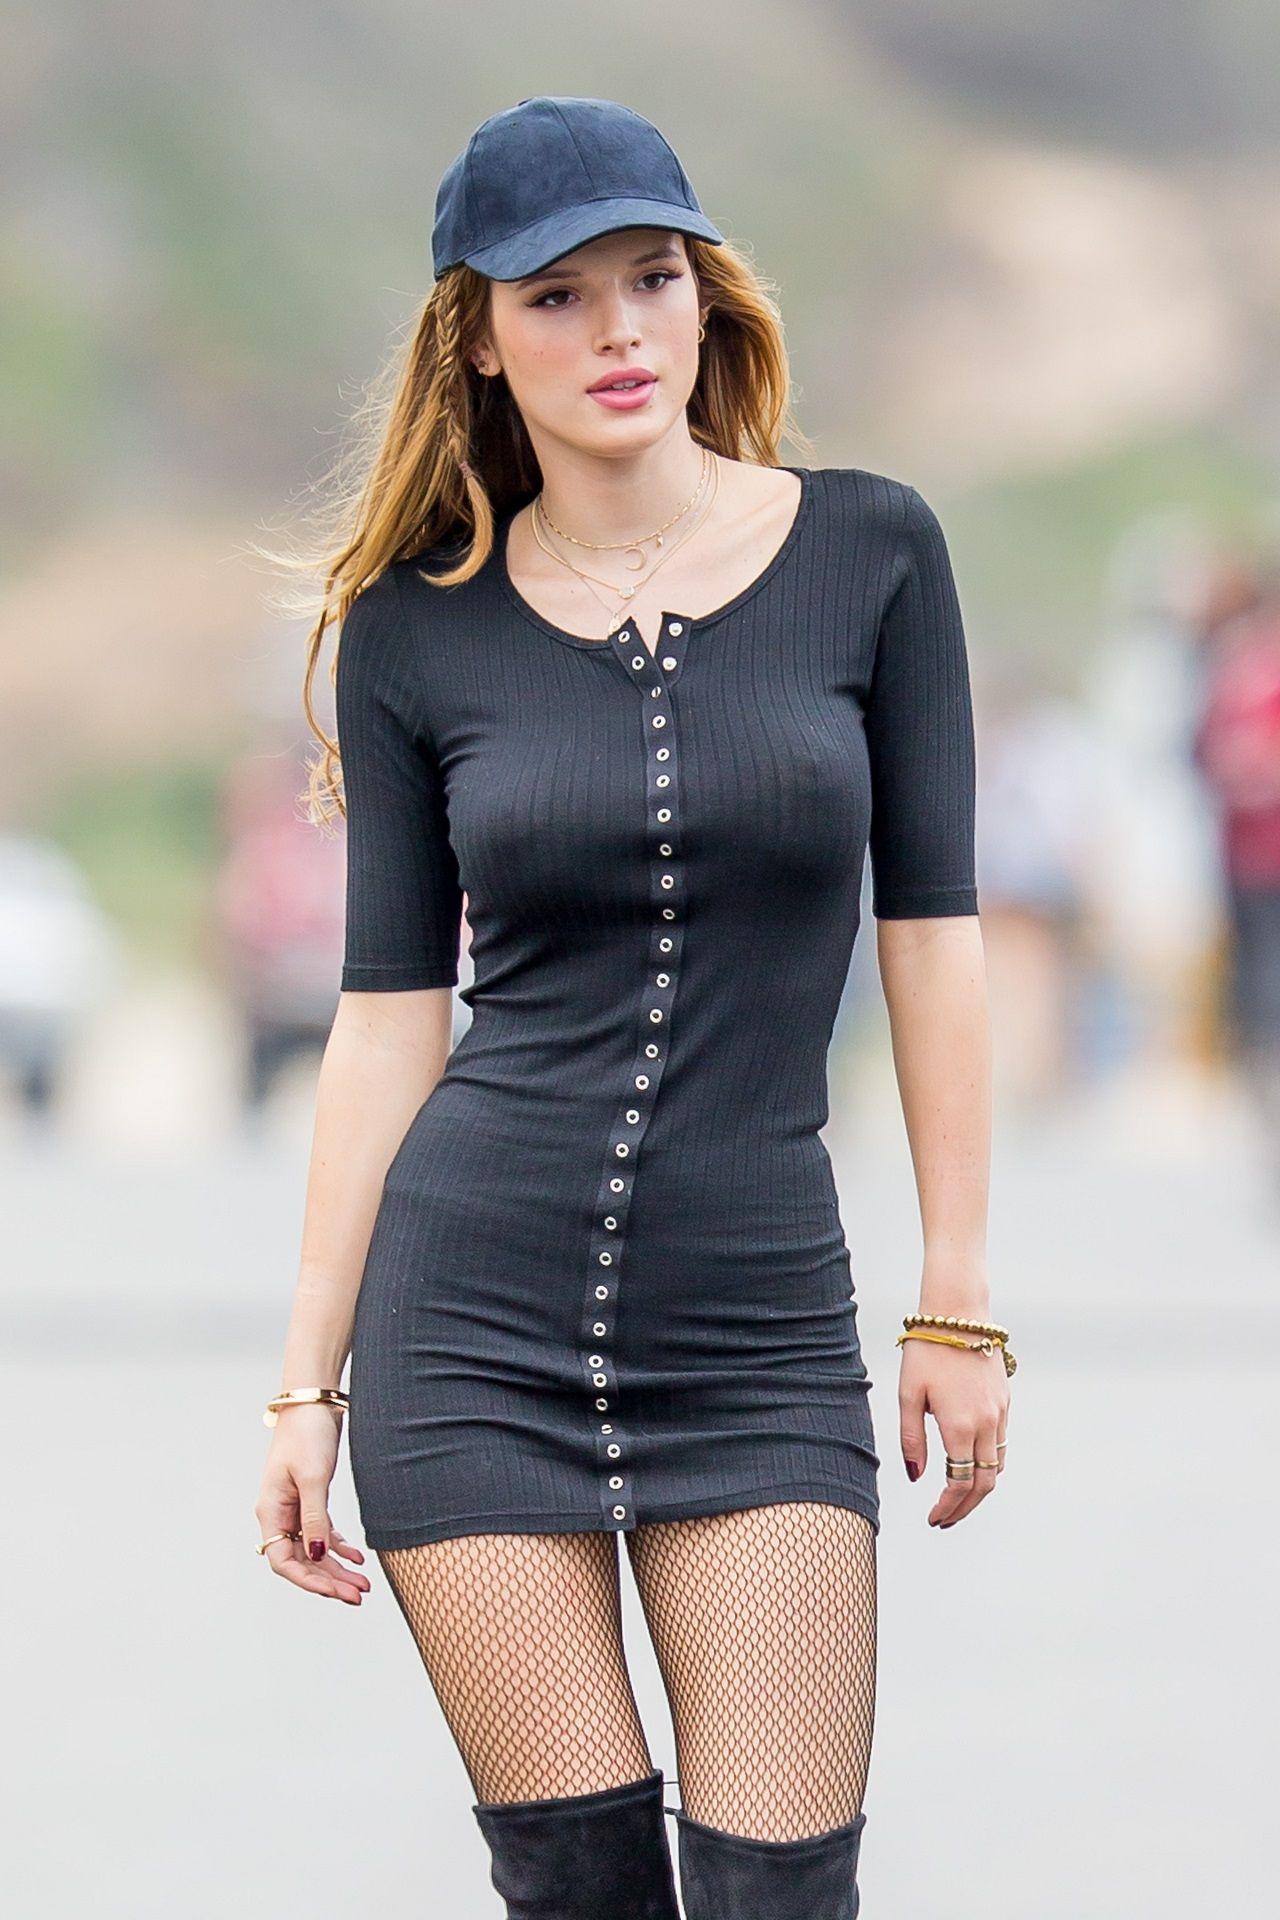 2019 Raquel Zimmermann nudes (45 photo), Ass, Bikini, Boobs, in bikini 2020